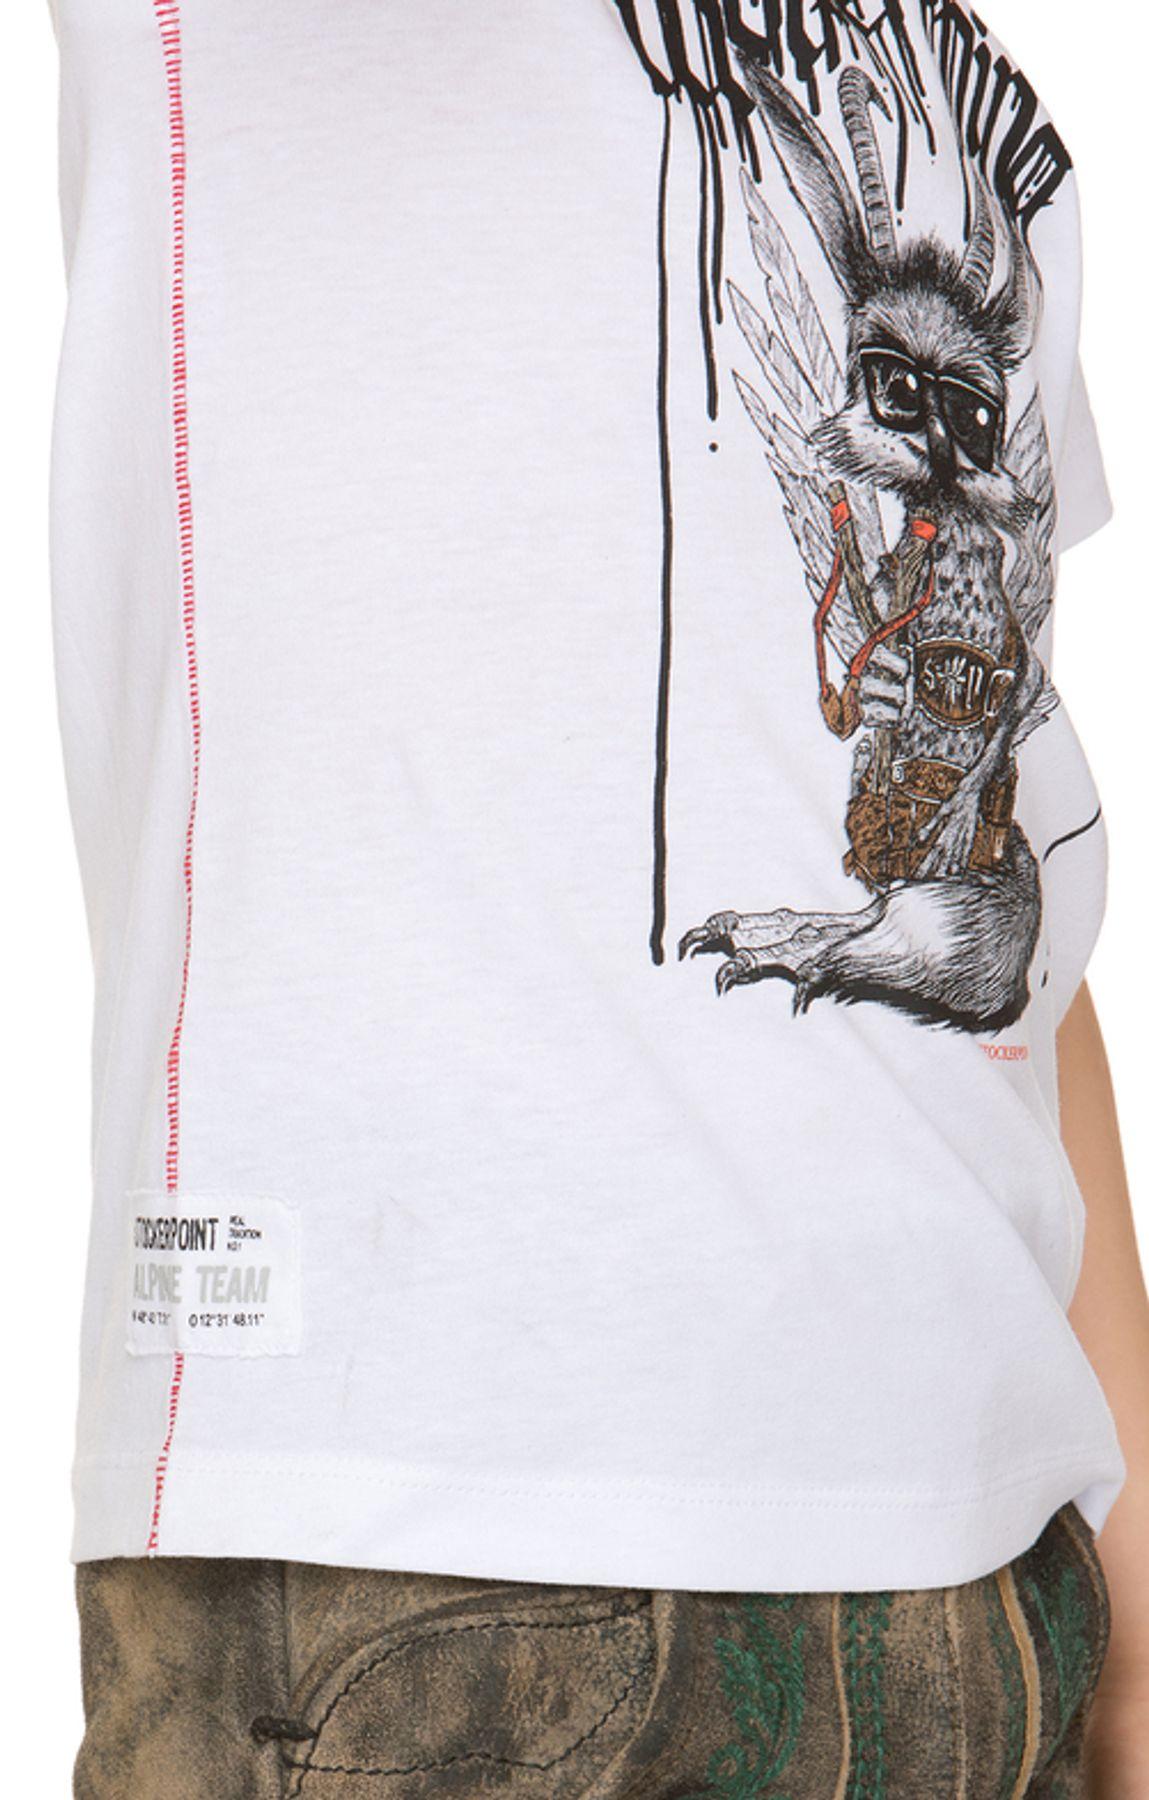 Stockerpoint - Kinder Trachten T-Shirt Wolpiboy, Gr. 86-140 – Bild 7